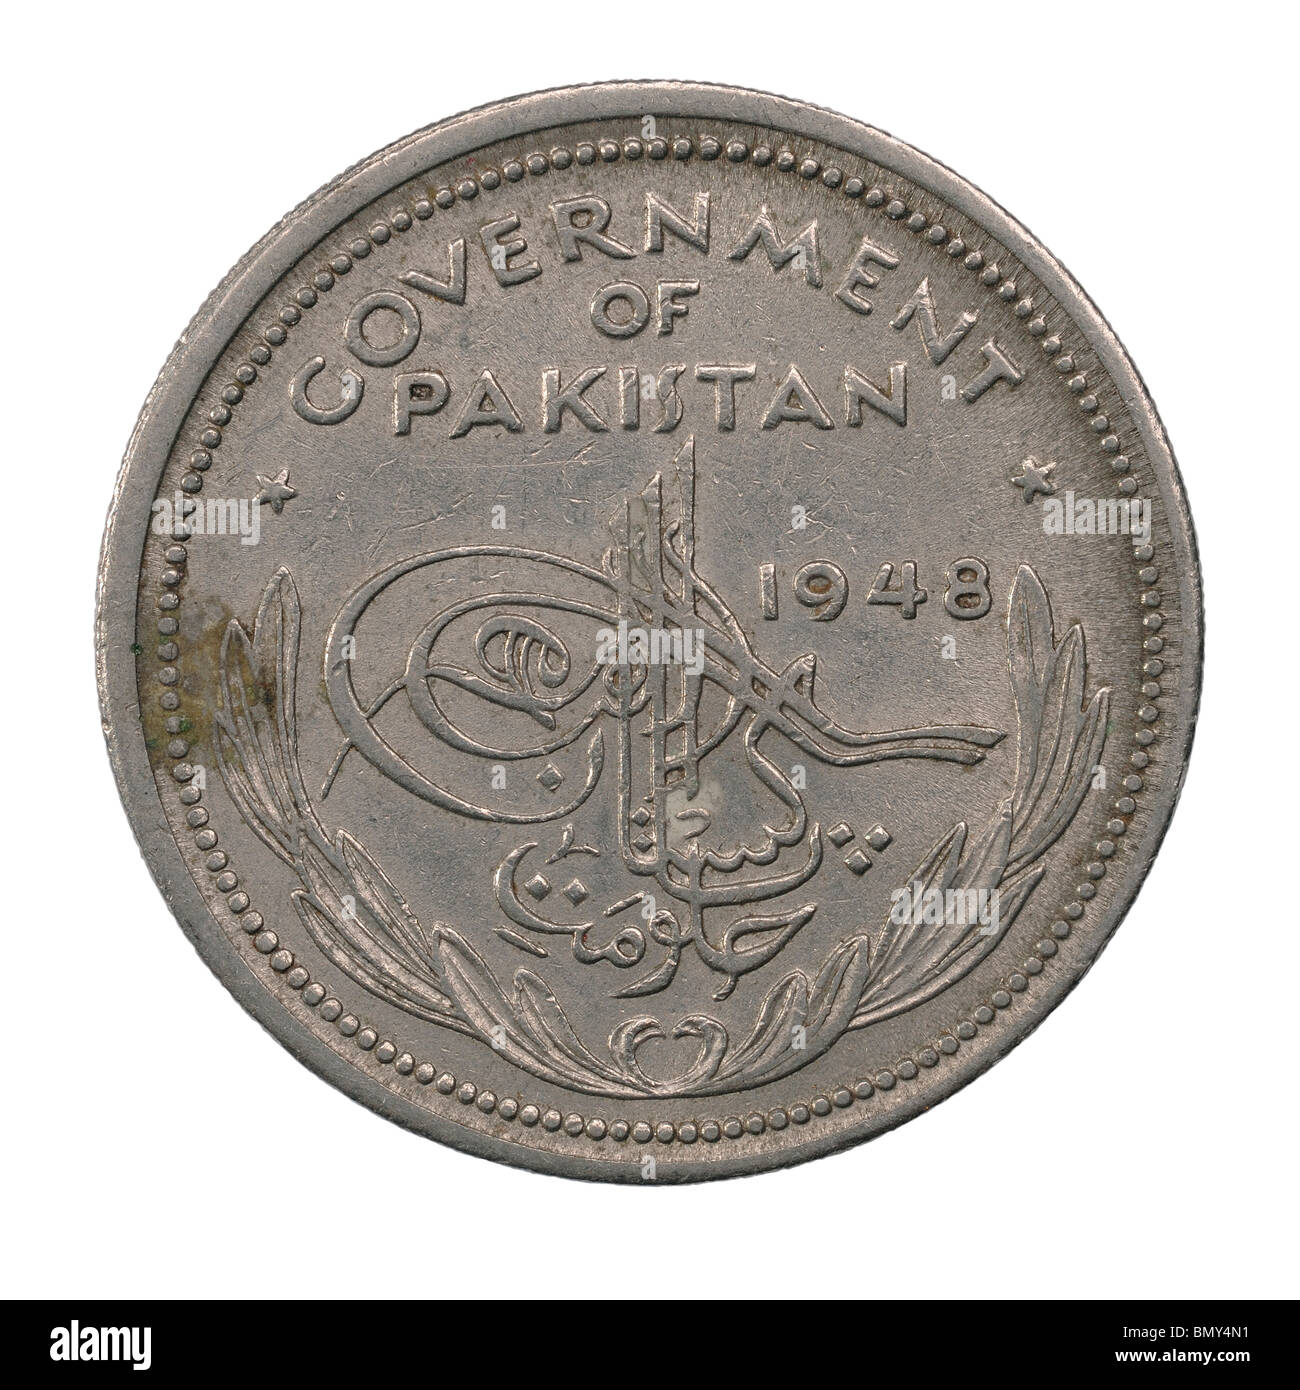 1948 Pakistan One Rupee coin - Stock Image